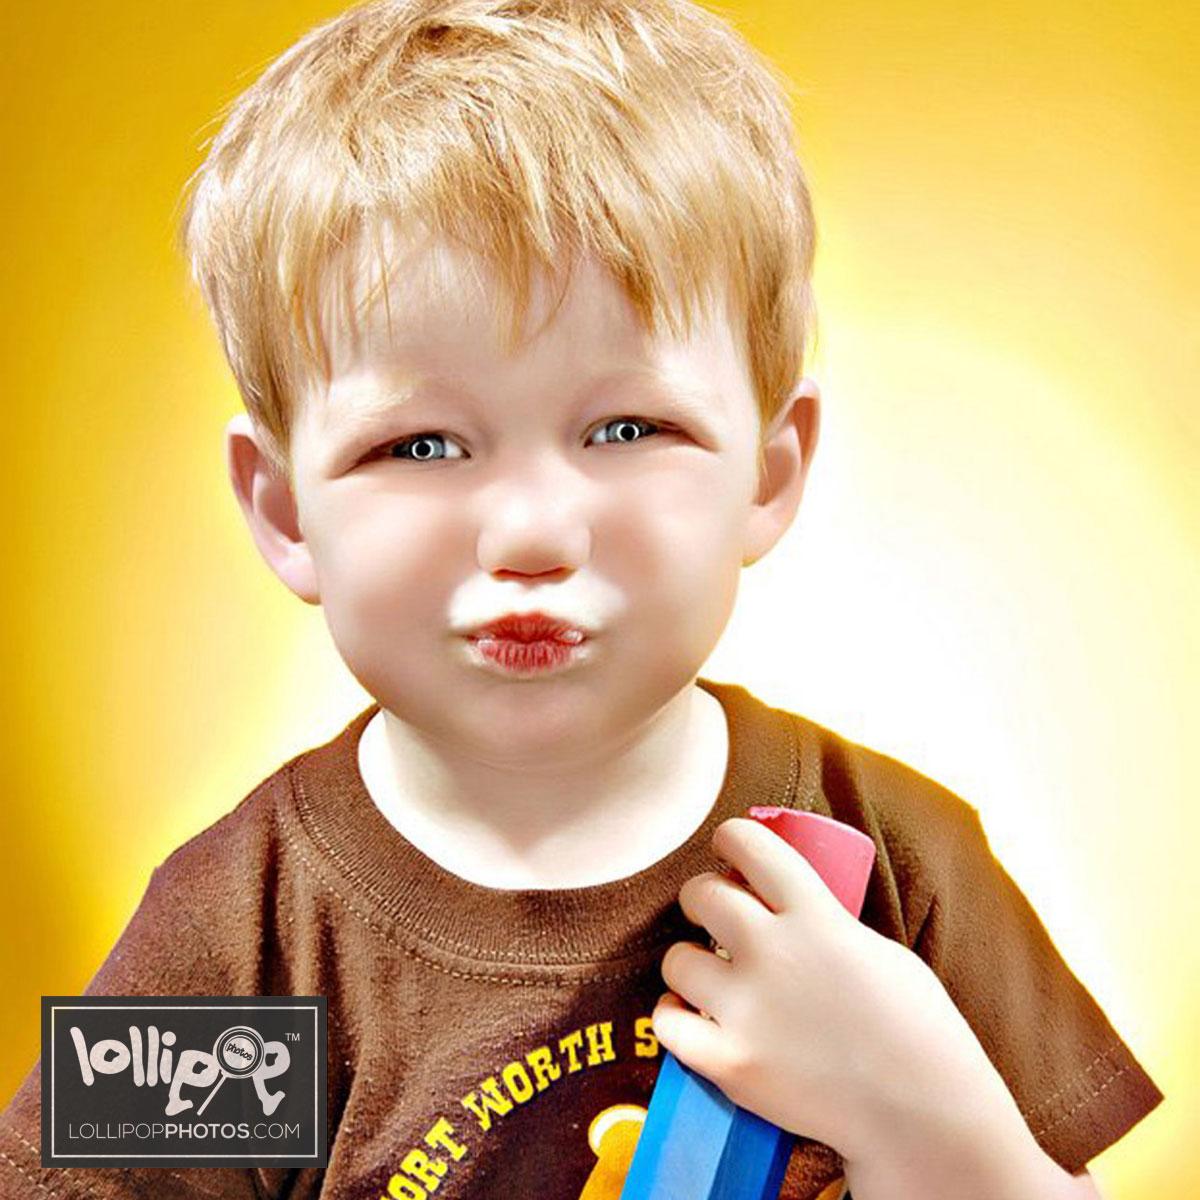 msdig-nora-canfield-lollipop-photos-093.jpg